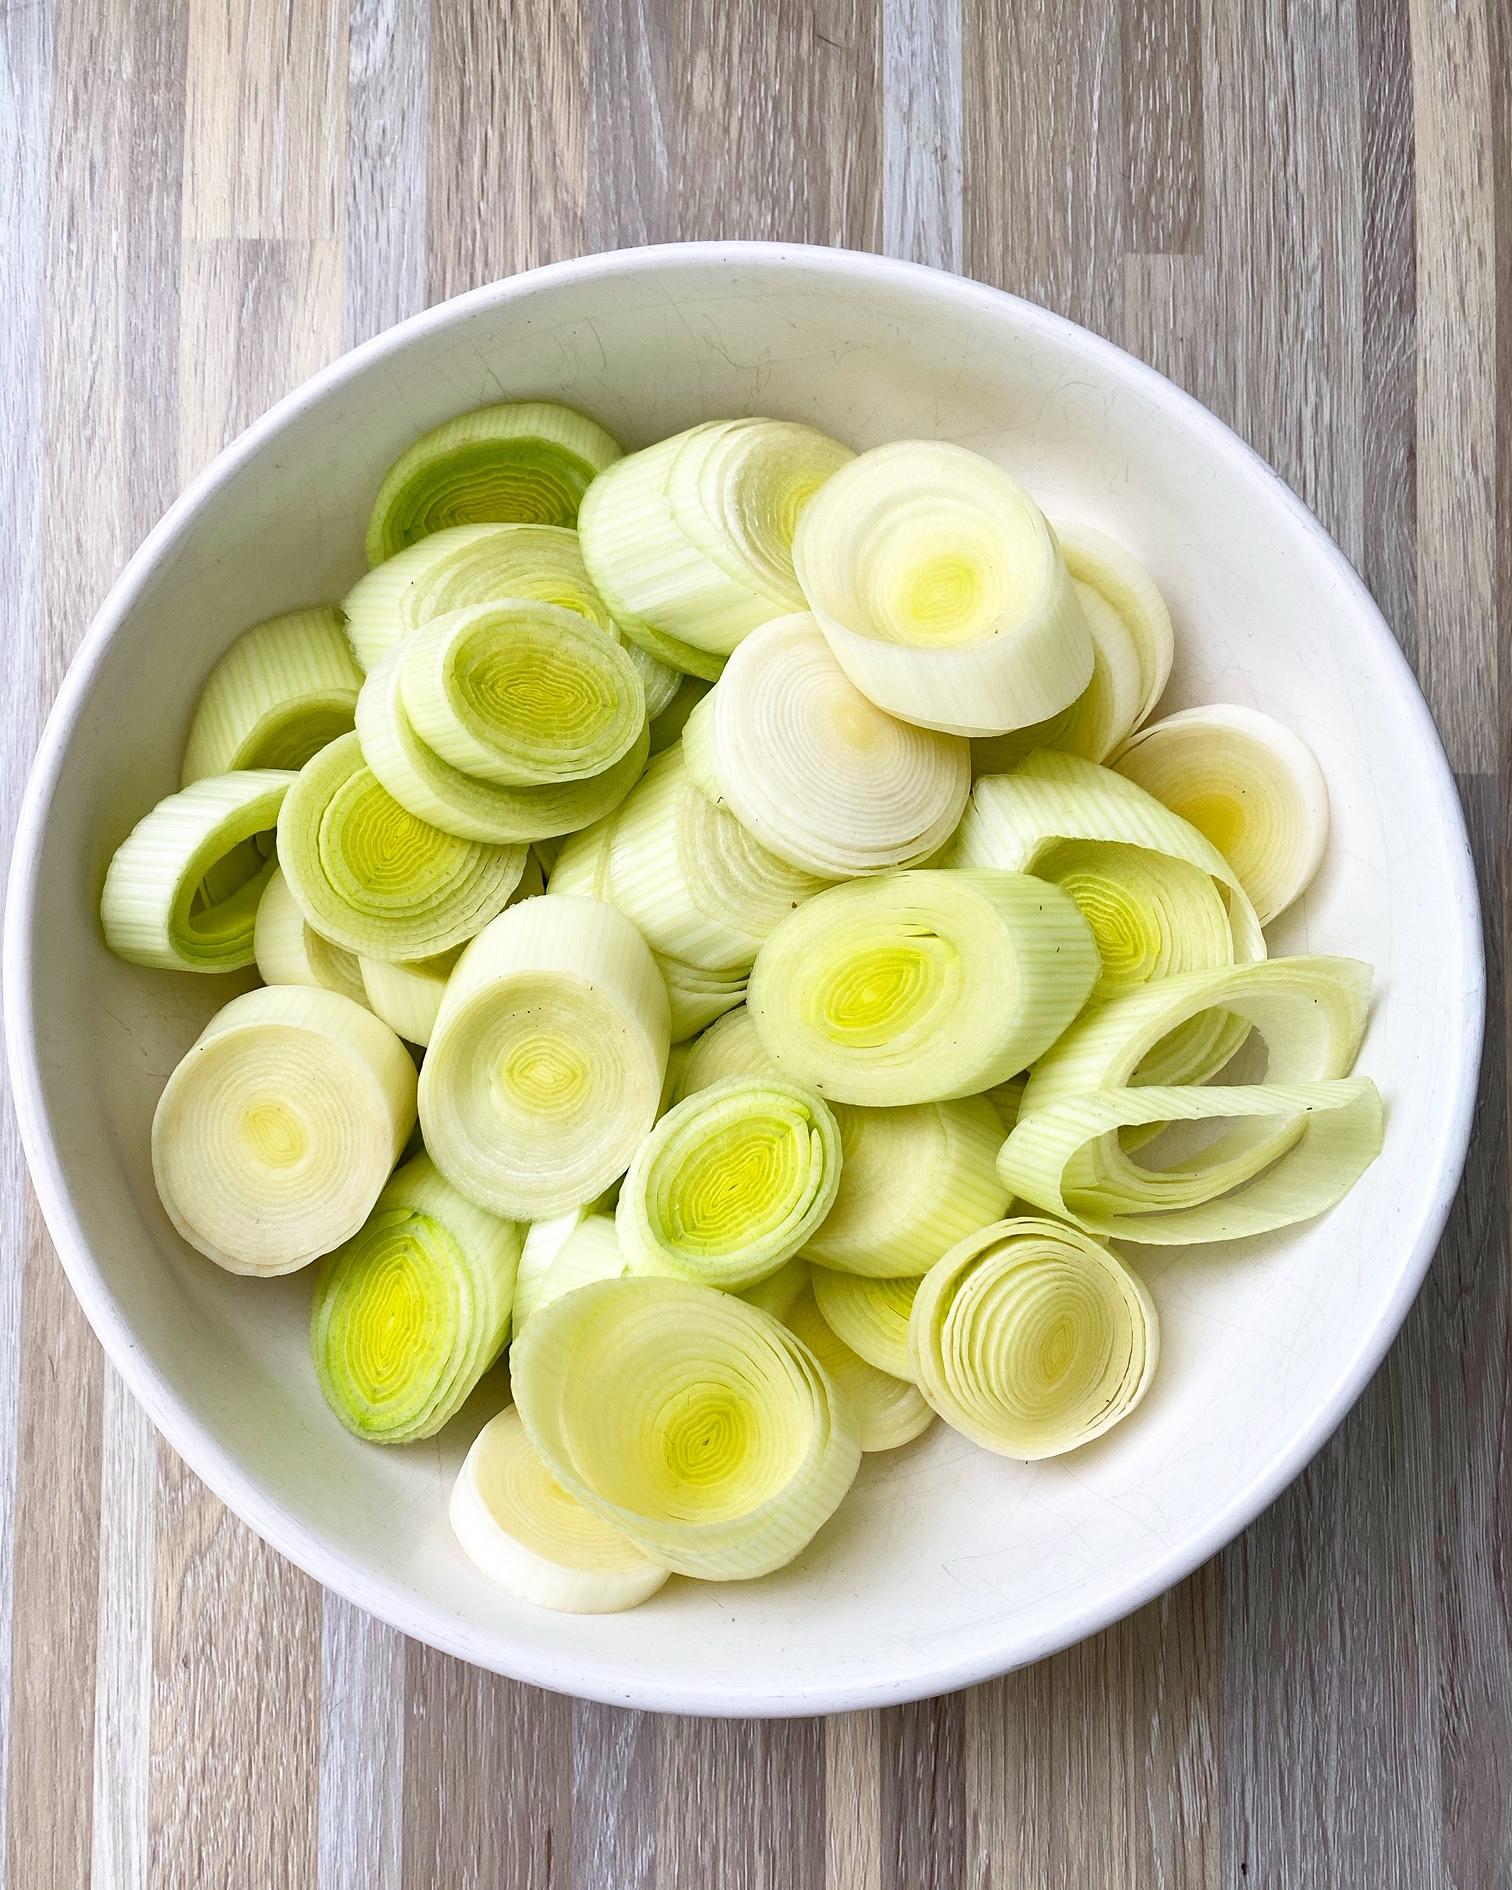 sliced leeks in a bowl